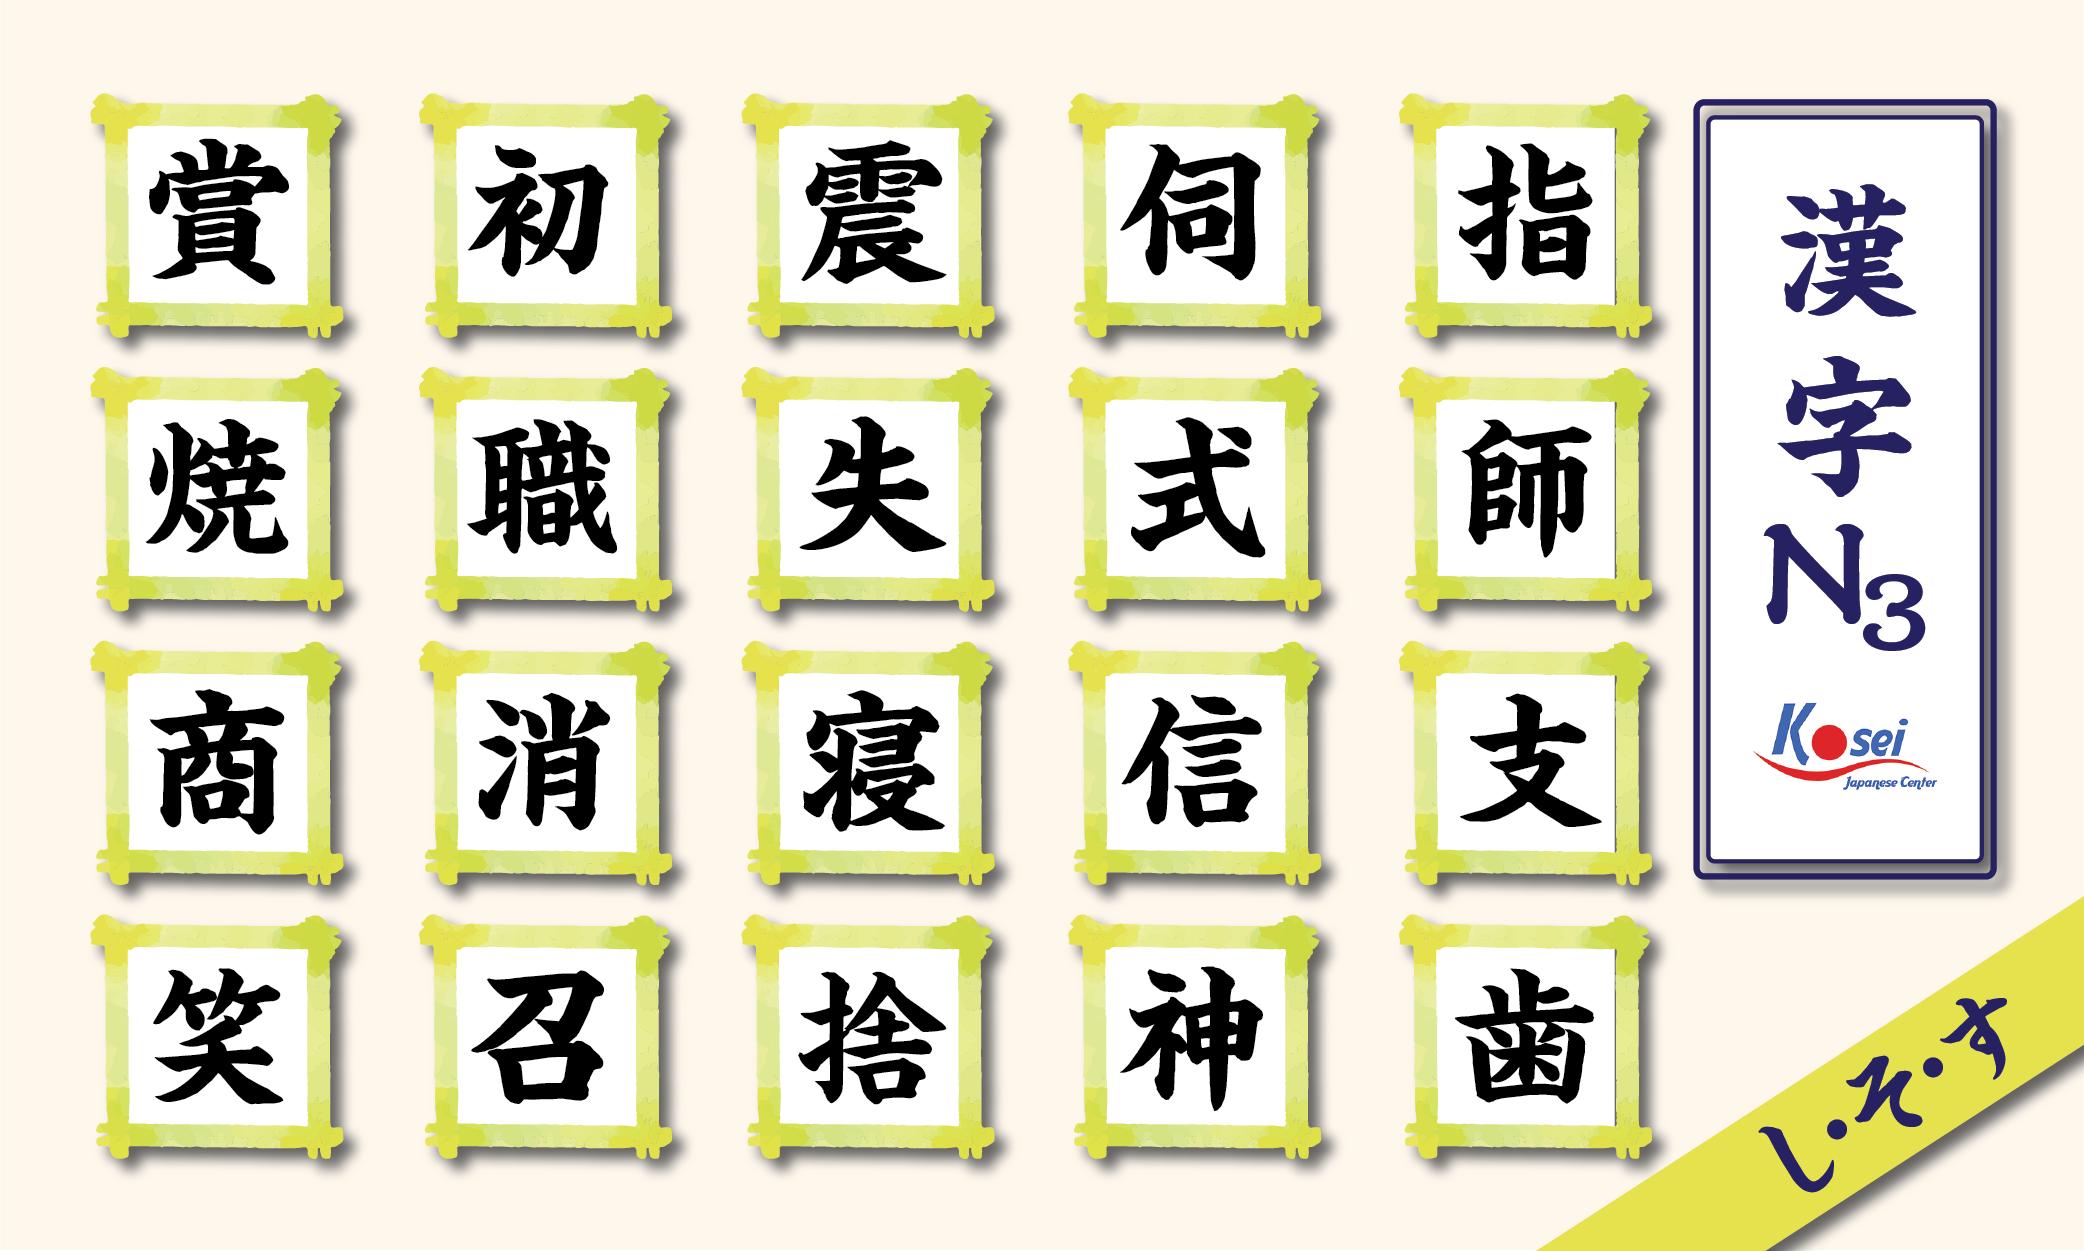 https://kosei.vn/tong-hop-kanji-n3-theo-am-on-hang-s-phan-2-n2244.html